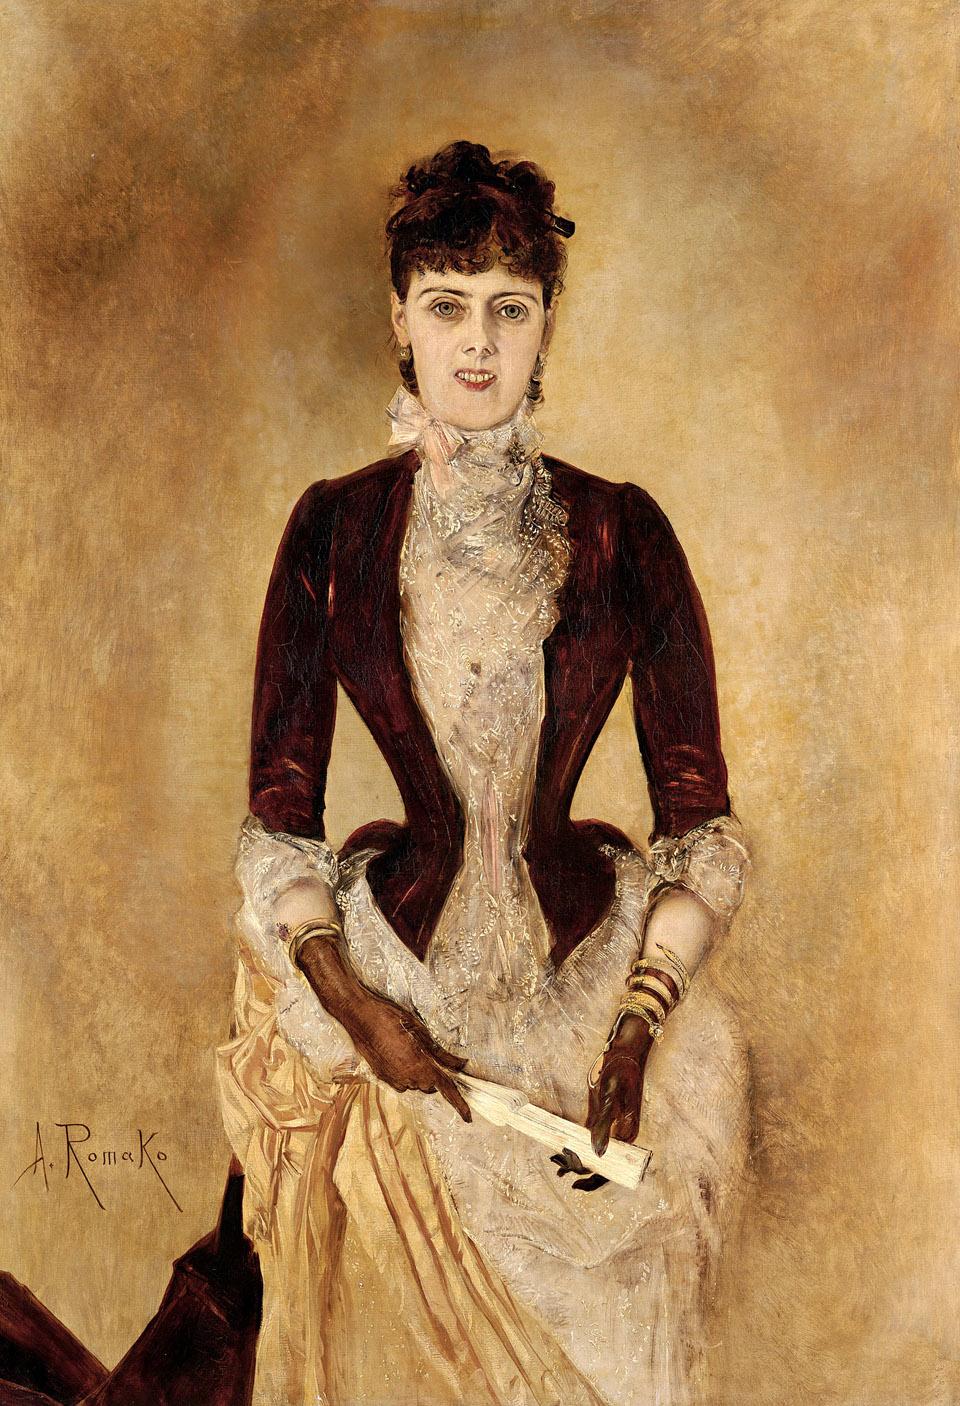 Anton_Romako_-_Bildnis_Isabella_Reisser_1885.jpg